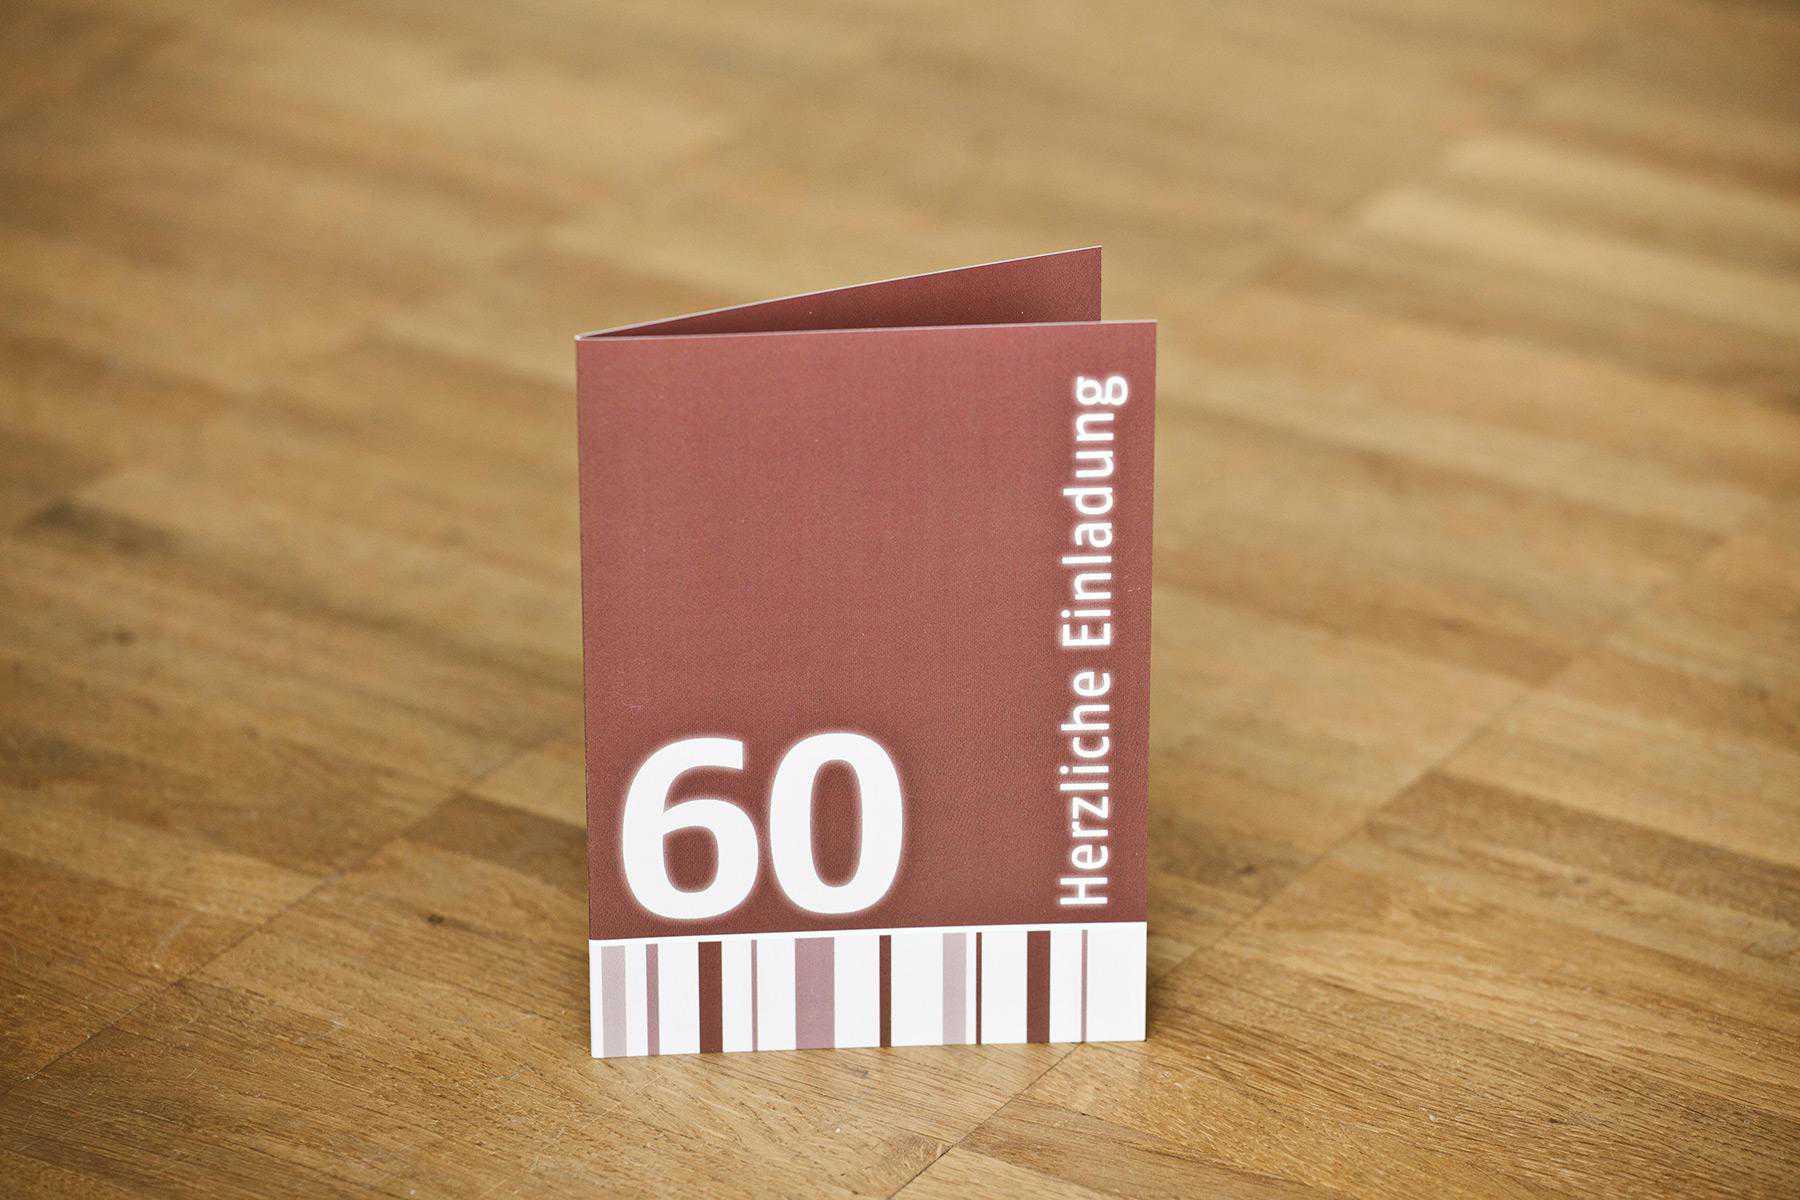 Clipart einladung 60 geburtstag clip black and white stock Einladungskarten 60 Geburtstag | Einladung Zum Paradies clip black and white stock